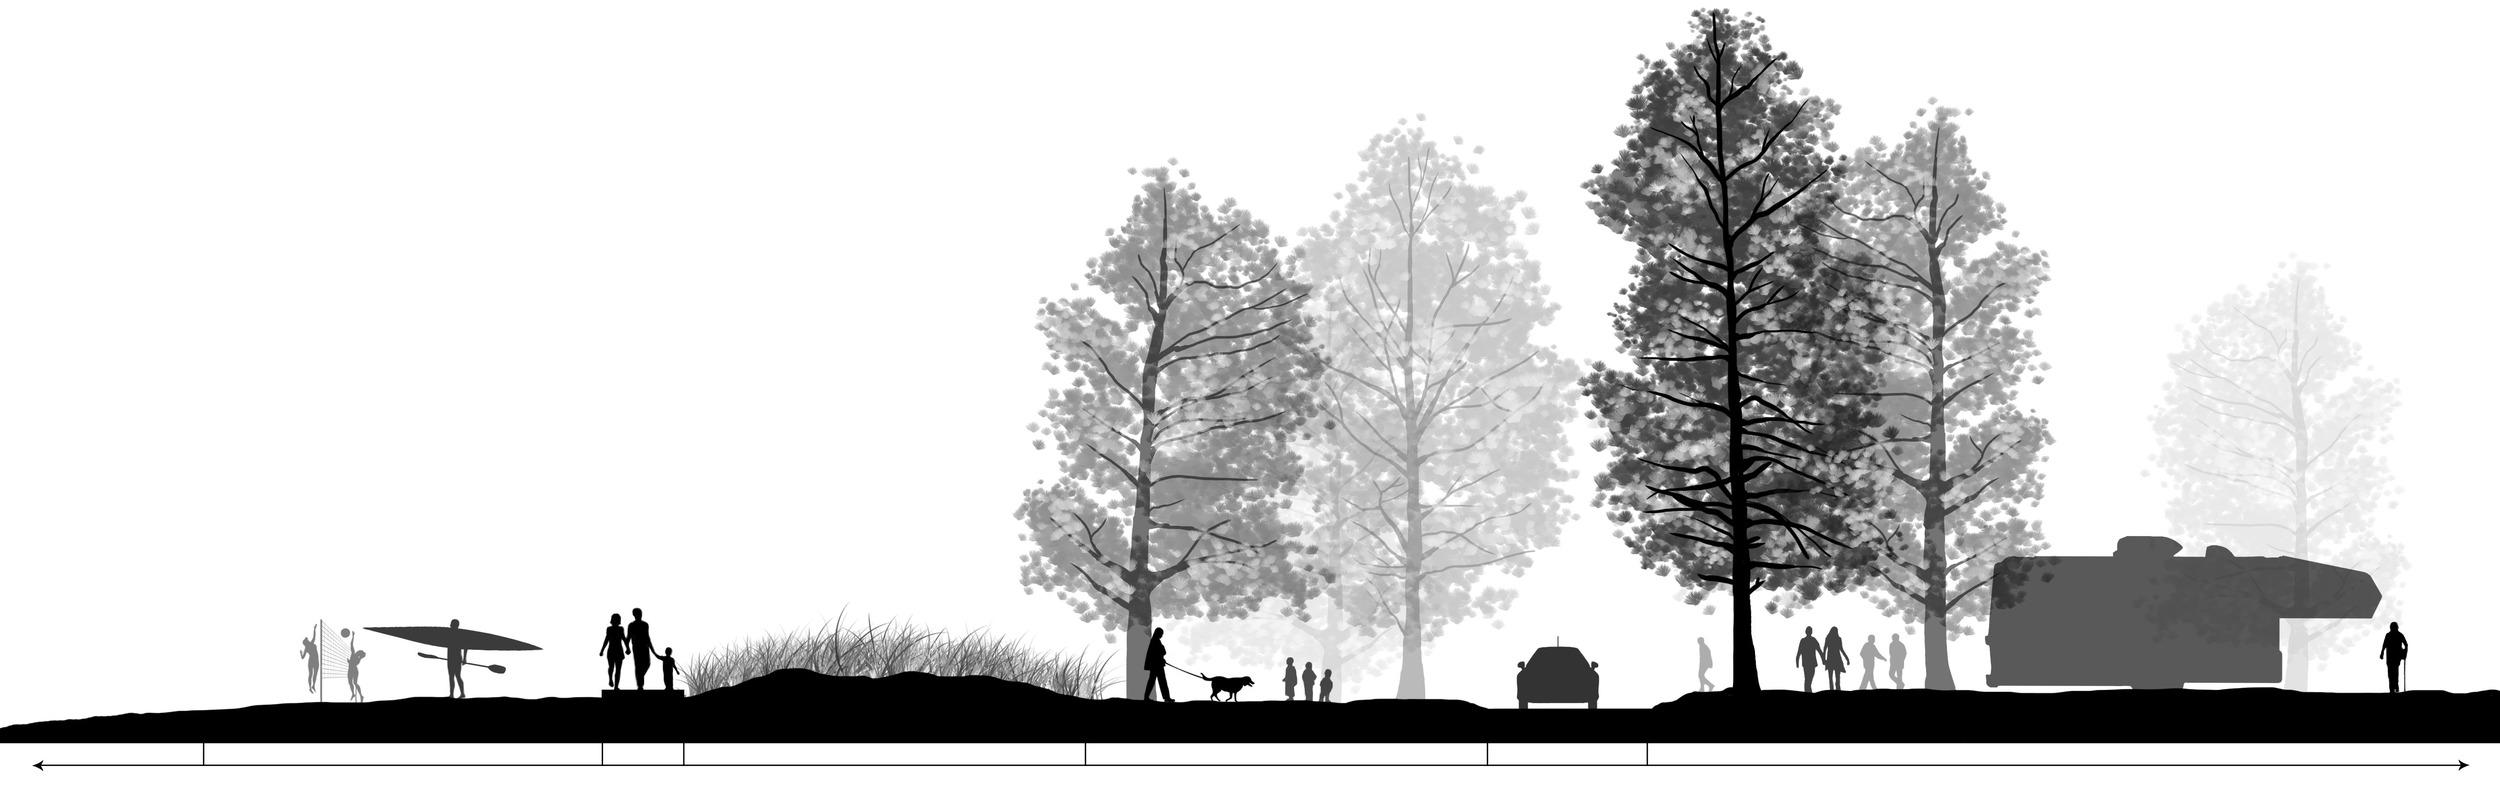 ojibway park section flat.jpg